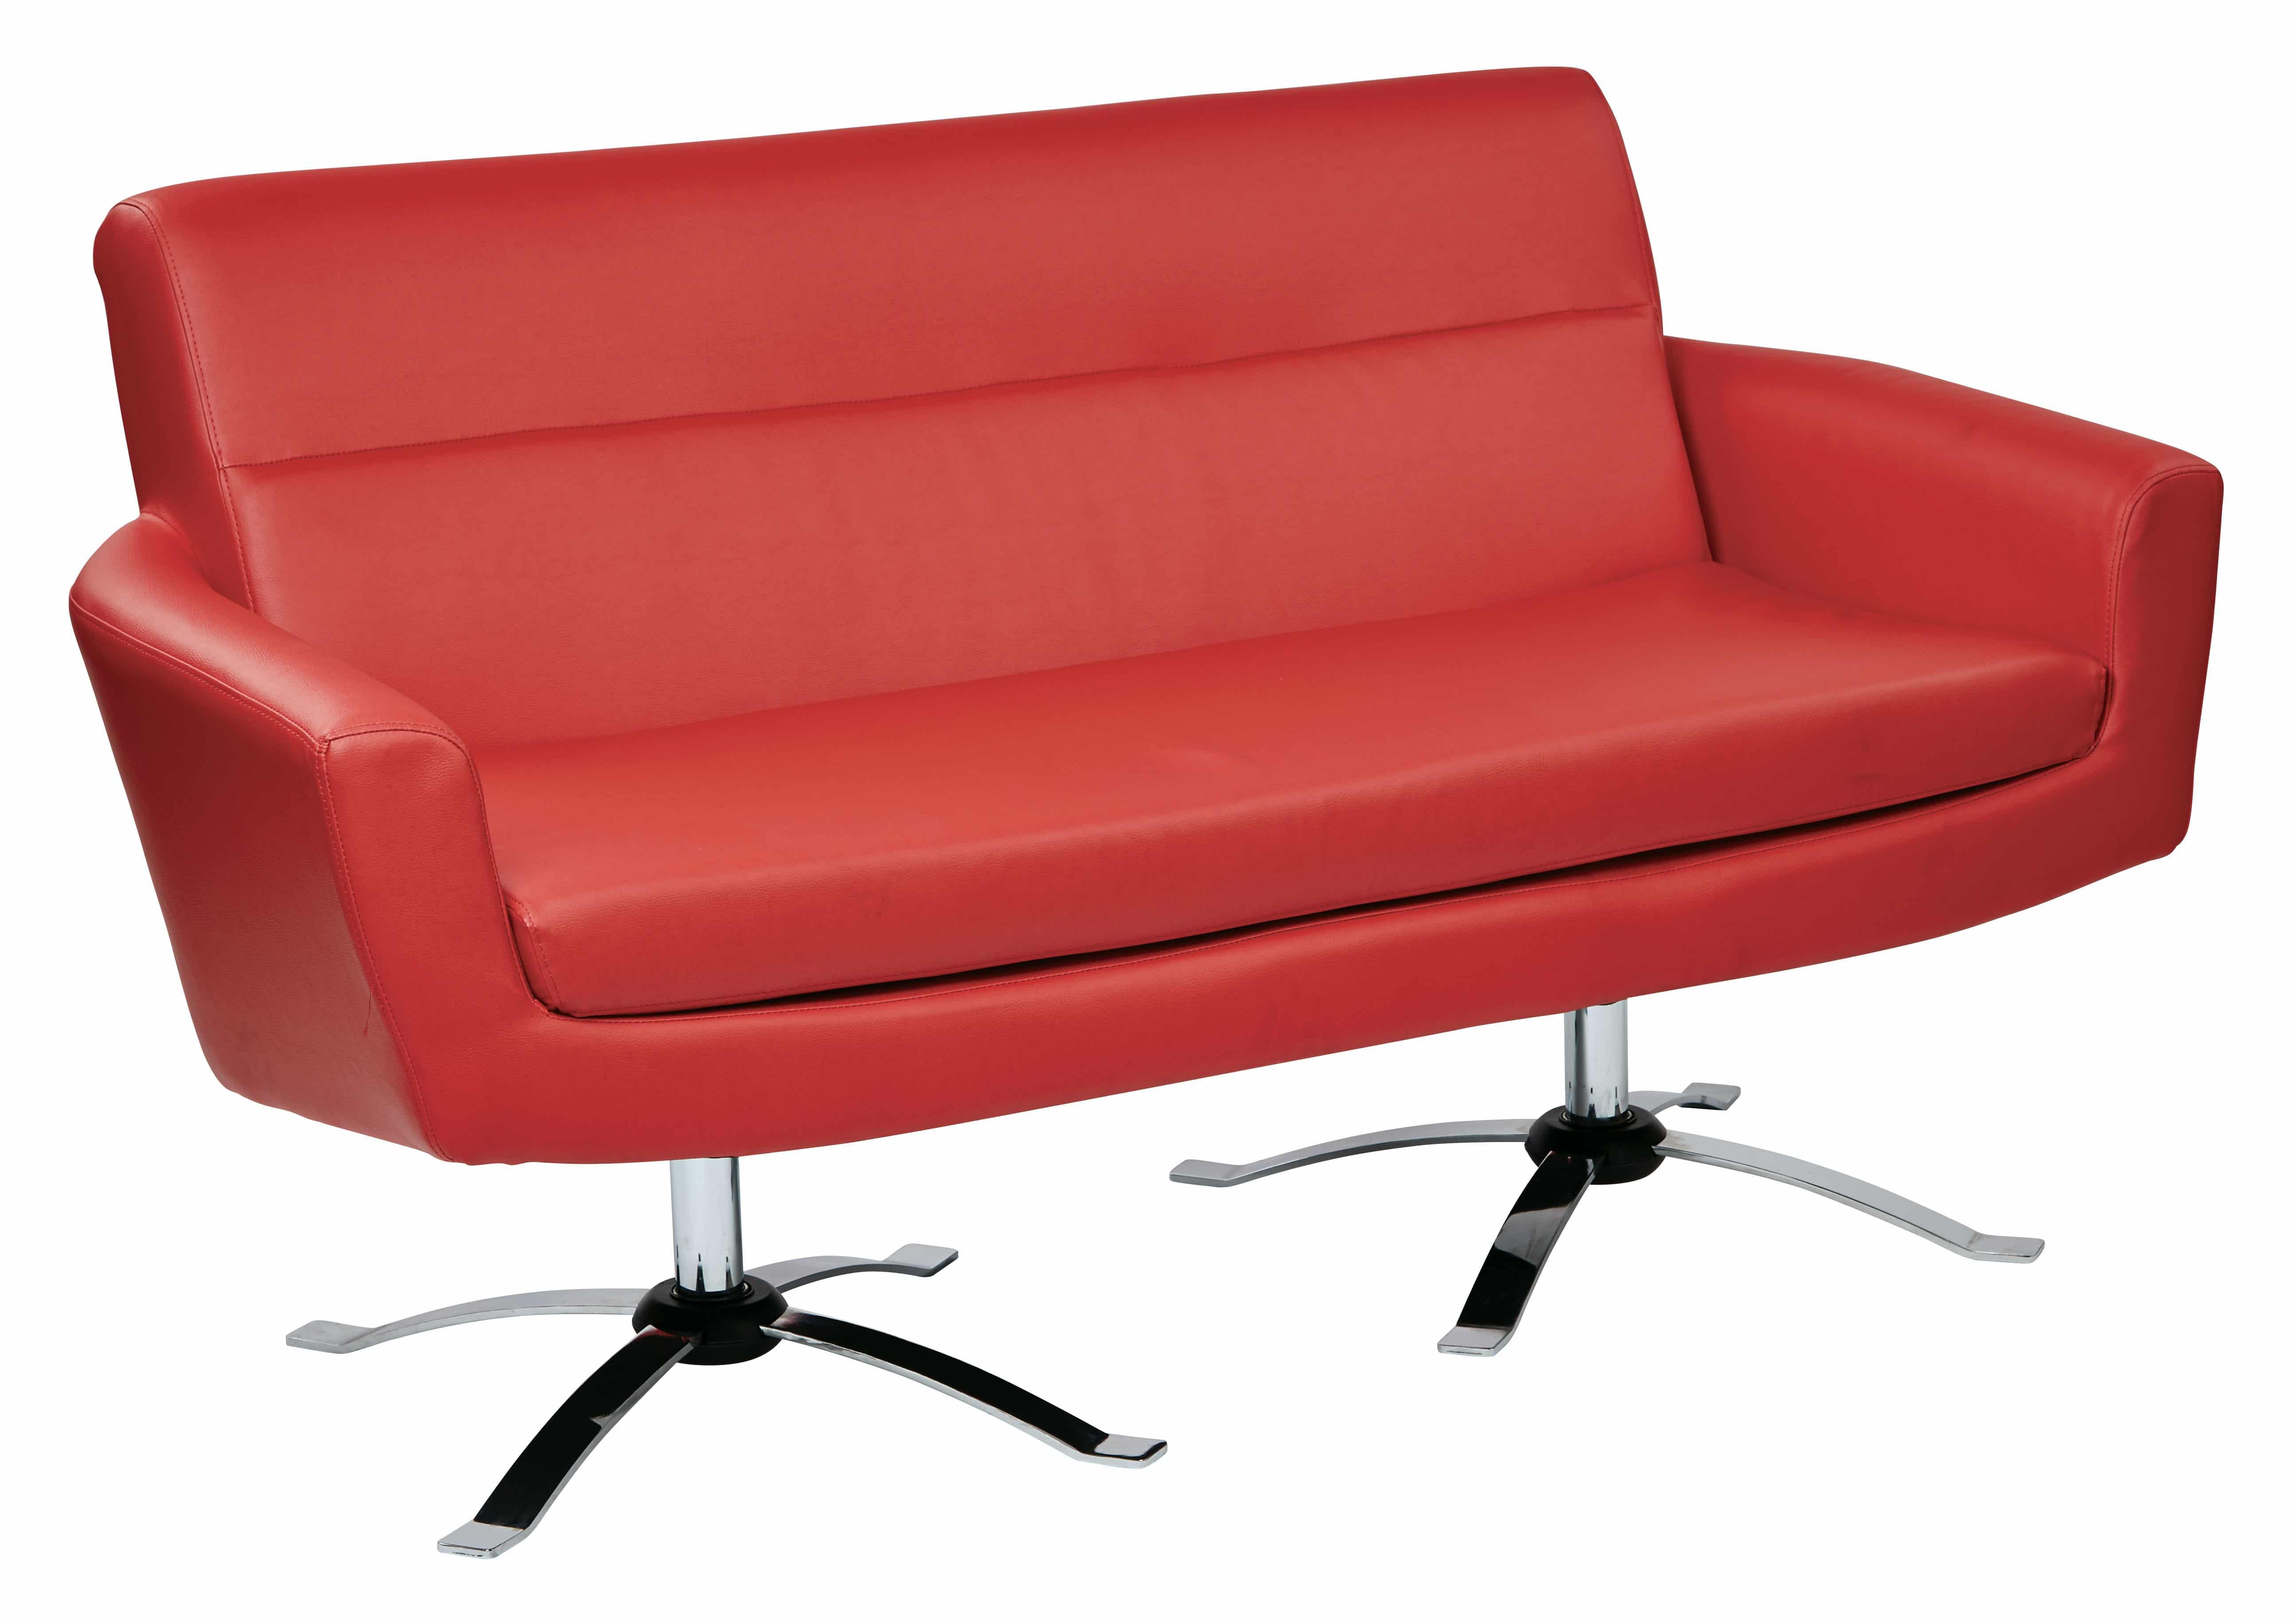 Nova Loveseat Pnp Office Furniture